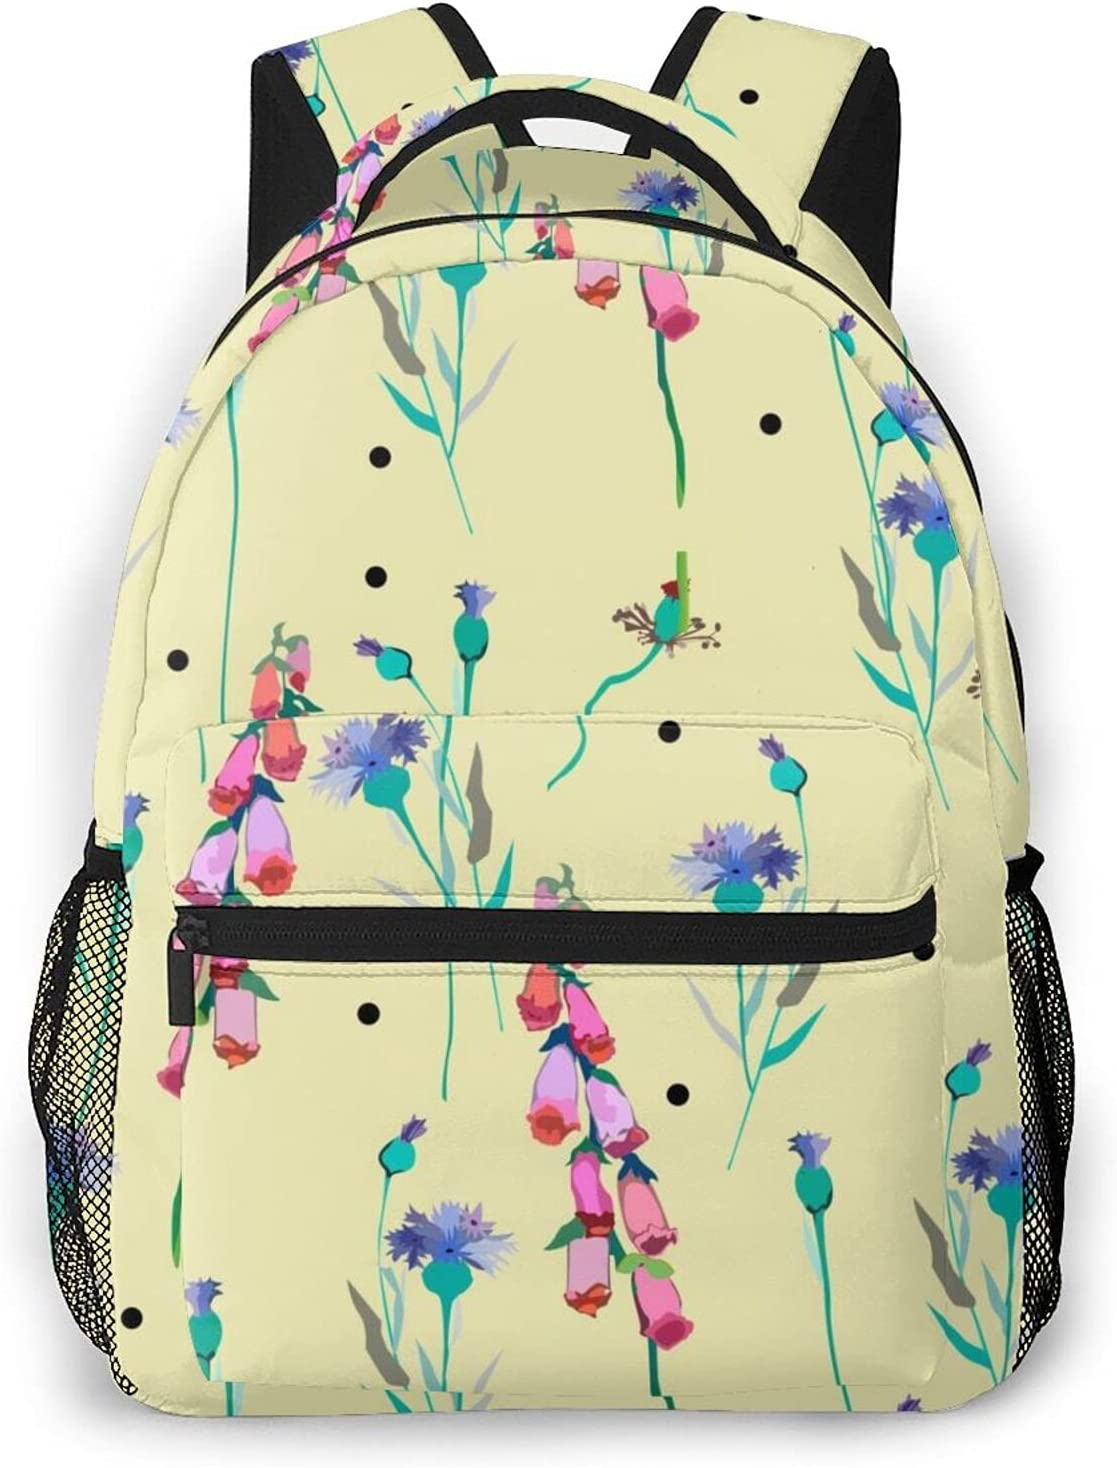 Lightweight Water Resistant Fashion Prints Backpacks For Teen Girls Women School Bookbags